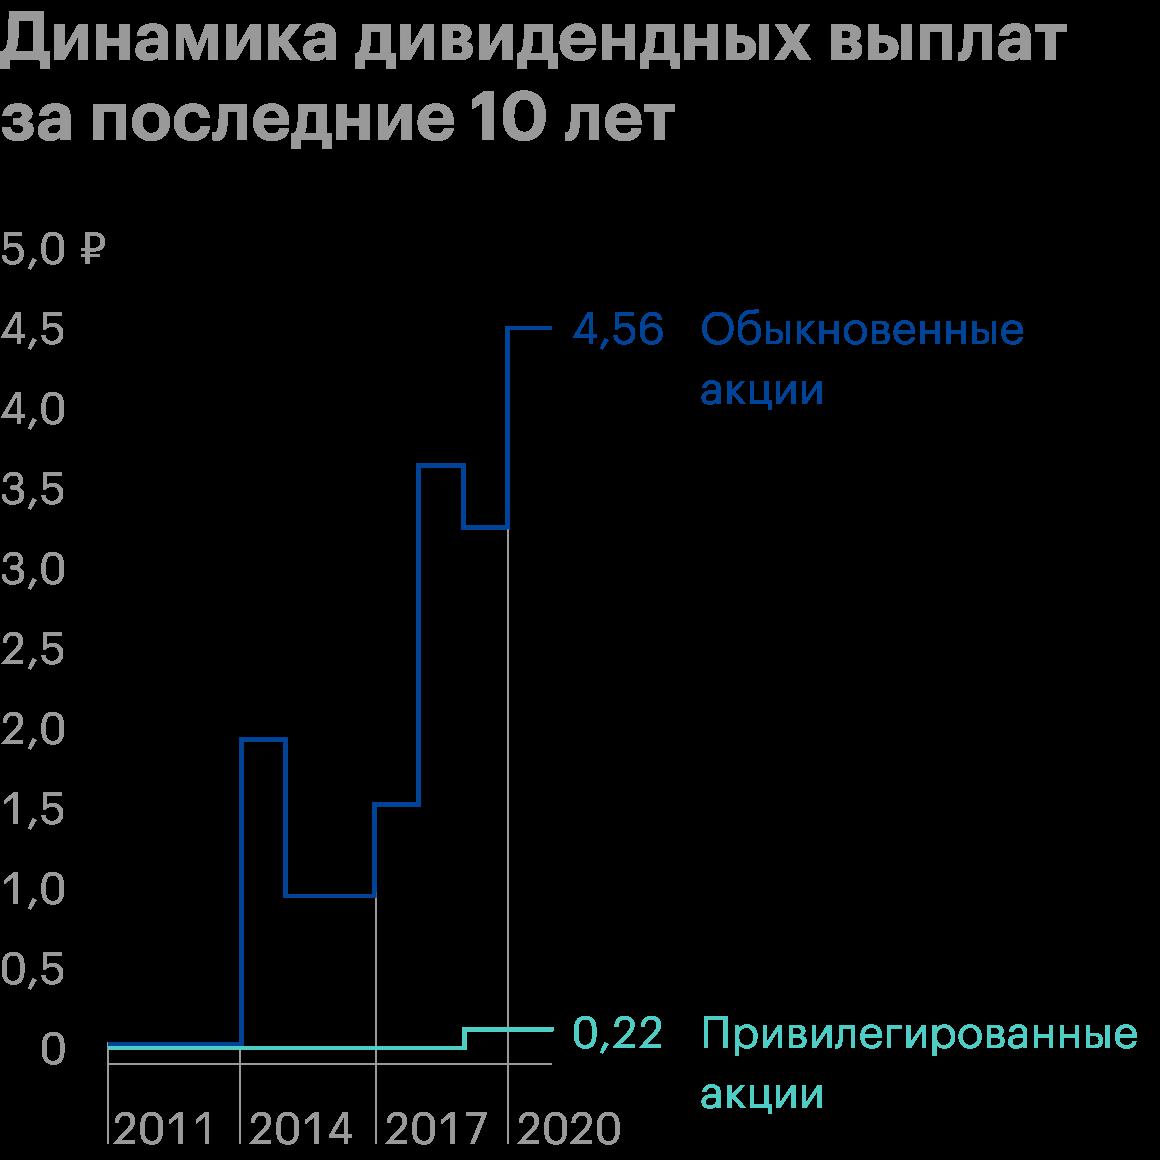 Источник: банк «Санкт-Петербург»